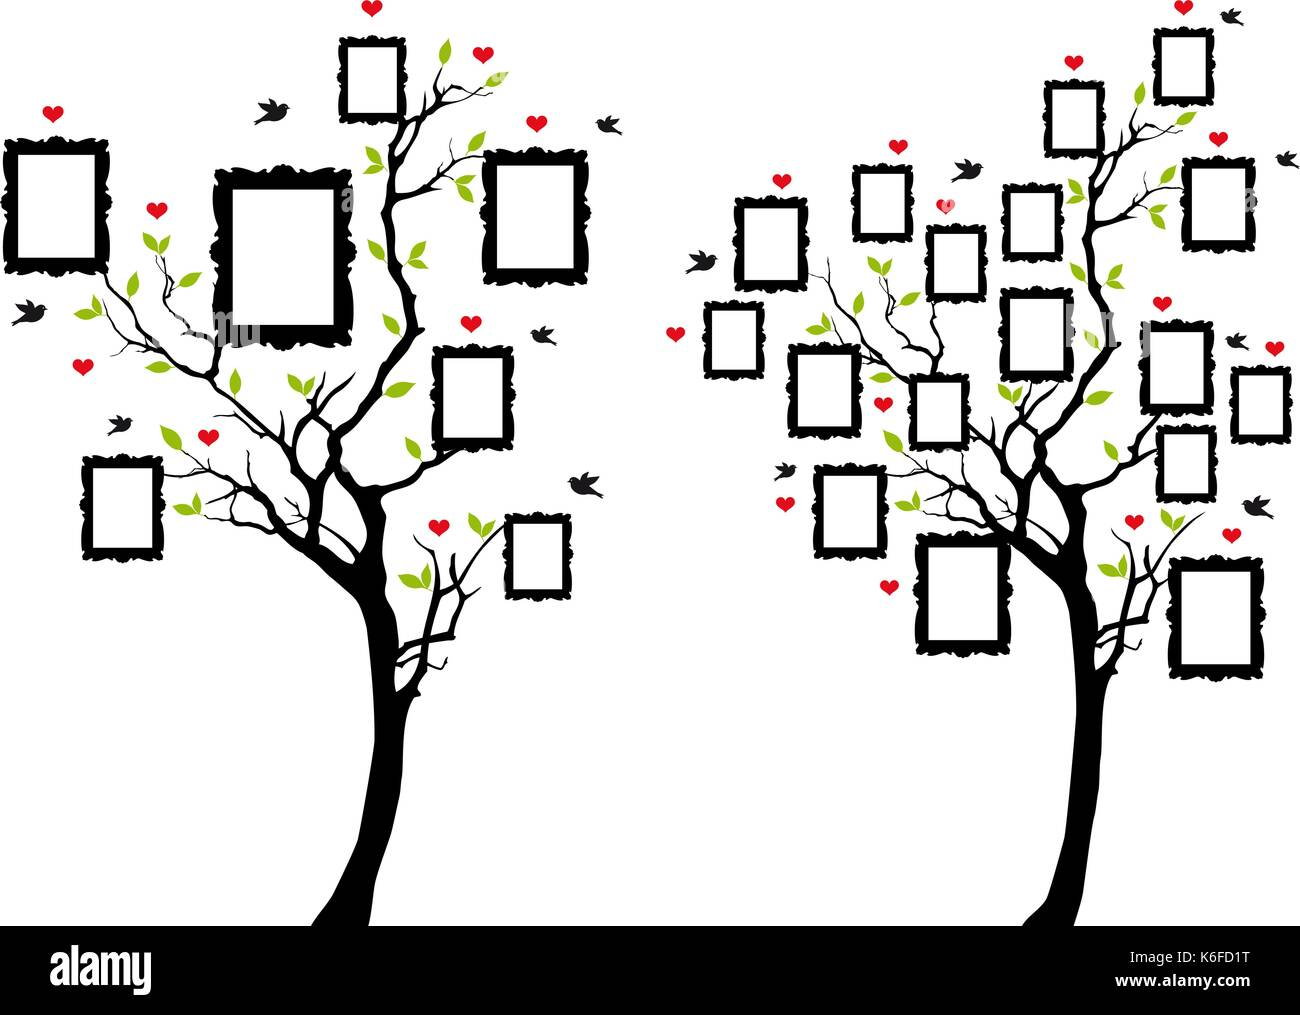 arbre g n alogique avec cadres photo vierge vector illustration vecteurs et illustration image. Black Bedroom Furniture Sets. Home Design Ideas